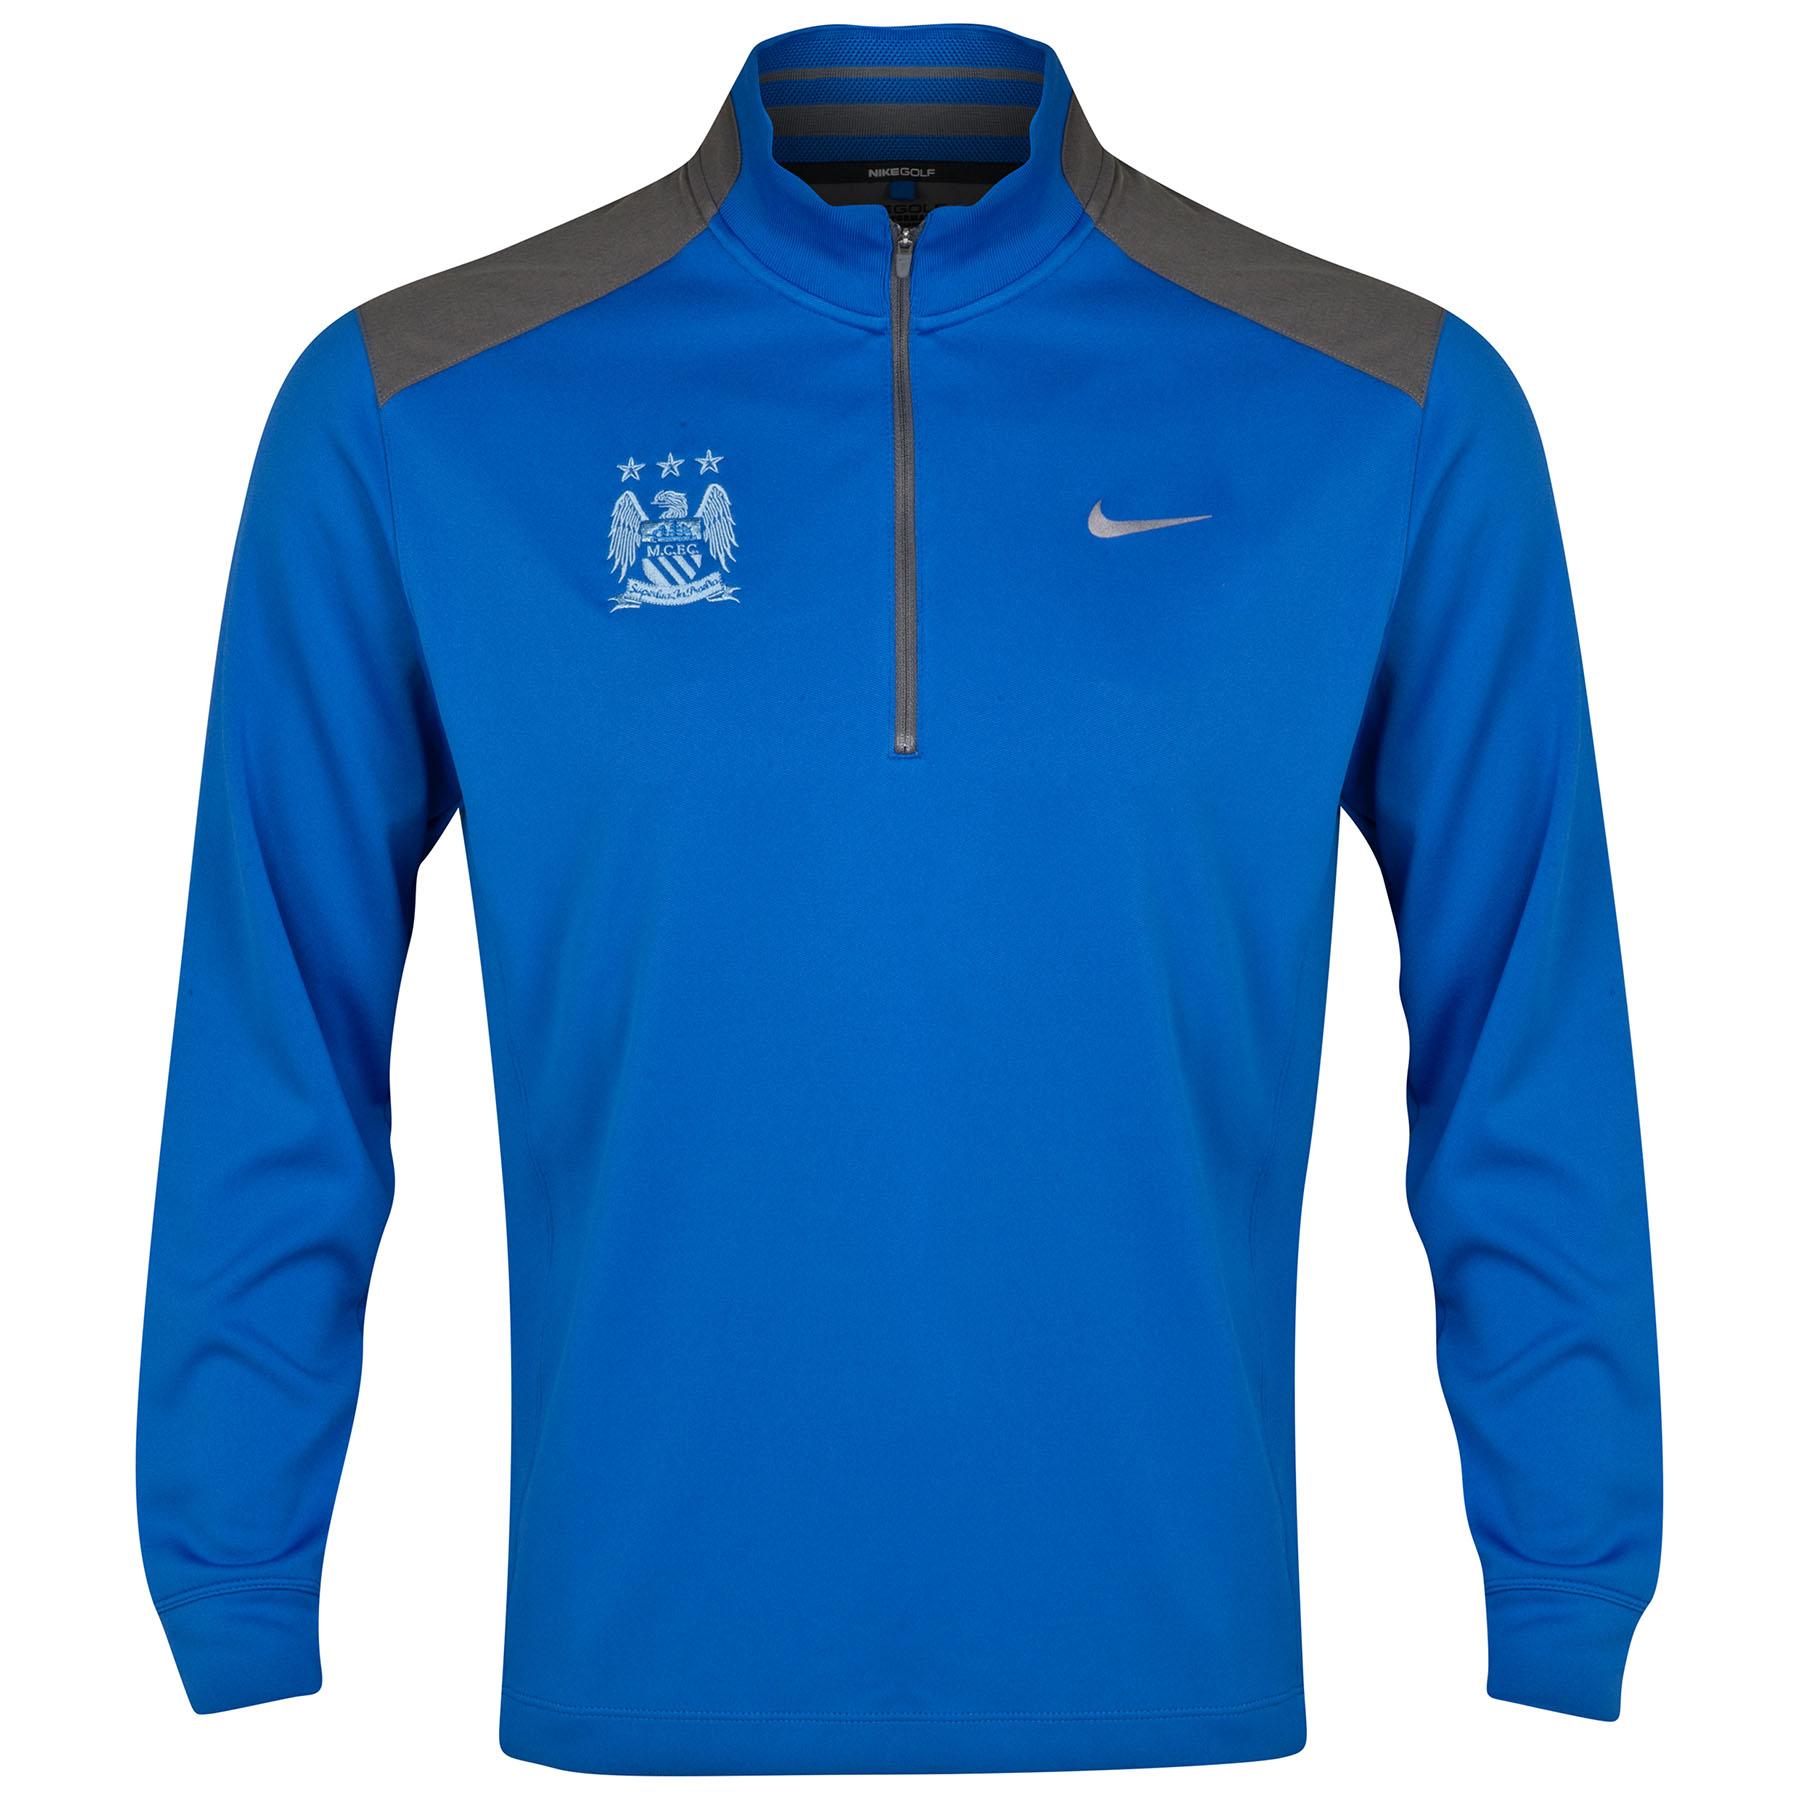 Manchester City Dri-Fit Performance Half Zip Top Royal Blue